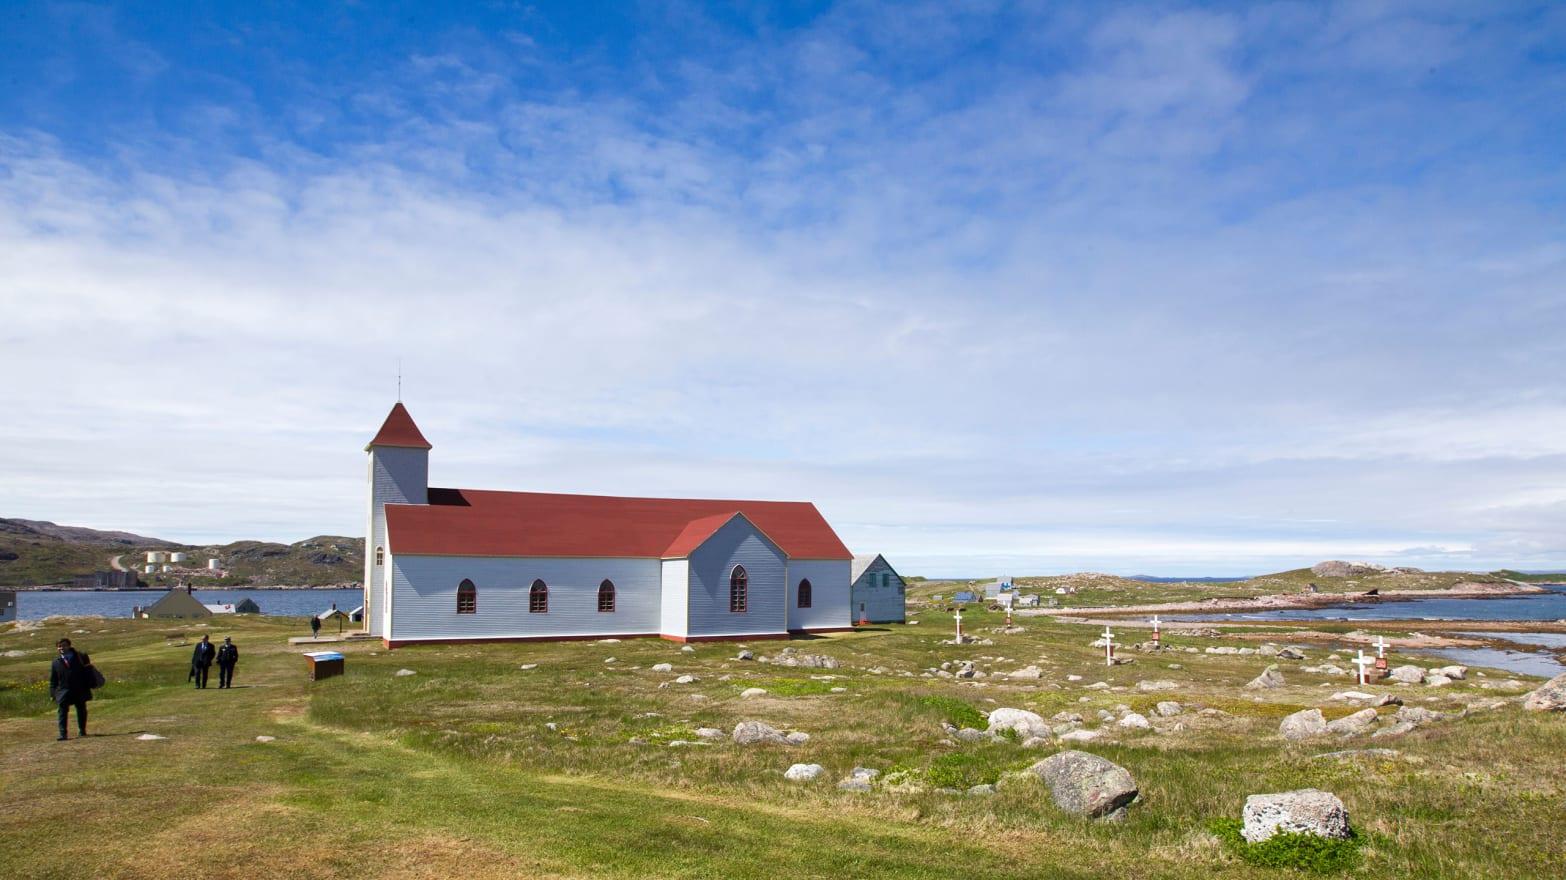 France S Most Dramatic Little Secret The Amazing History Of St Pierre Miquelon